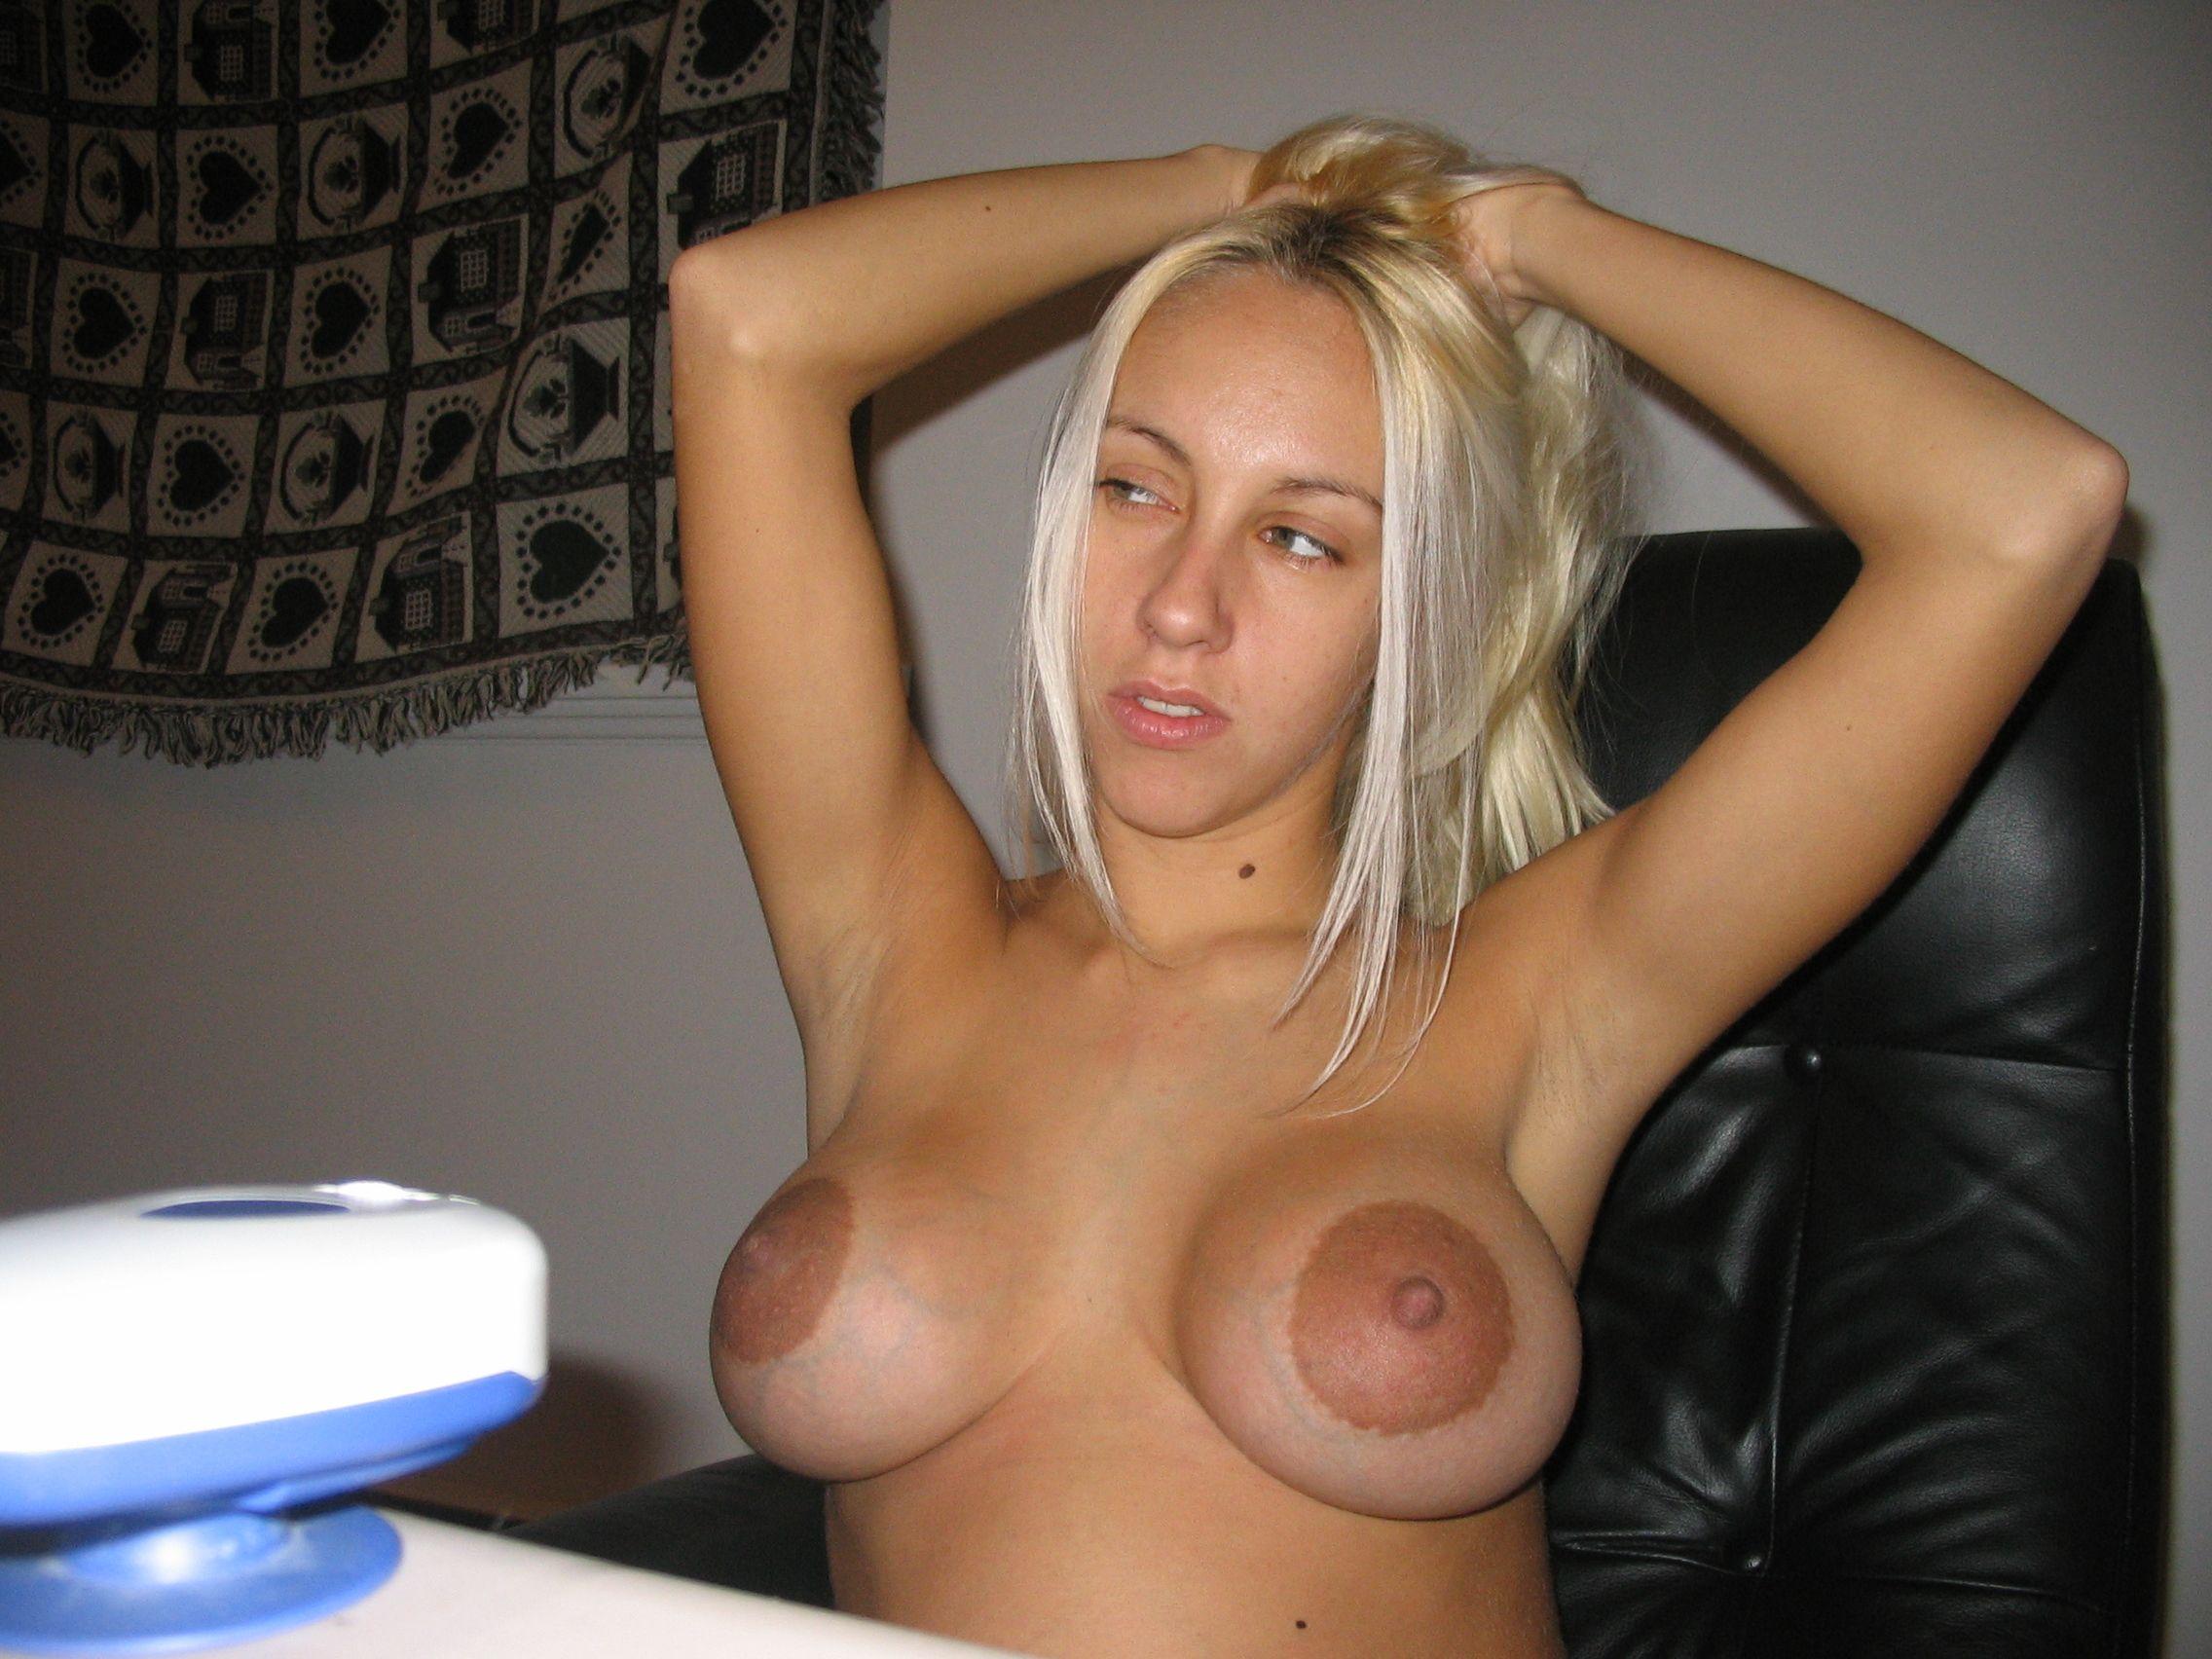 10786_amateurexpresszone.blogspot.com027_122_556lo.jpg